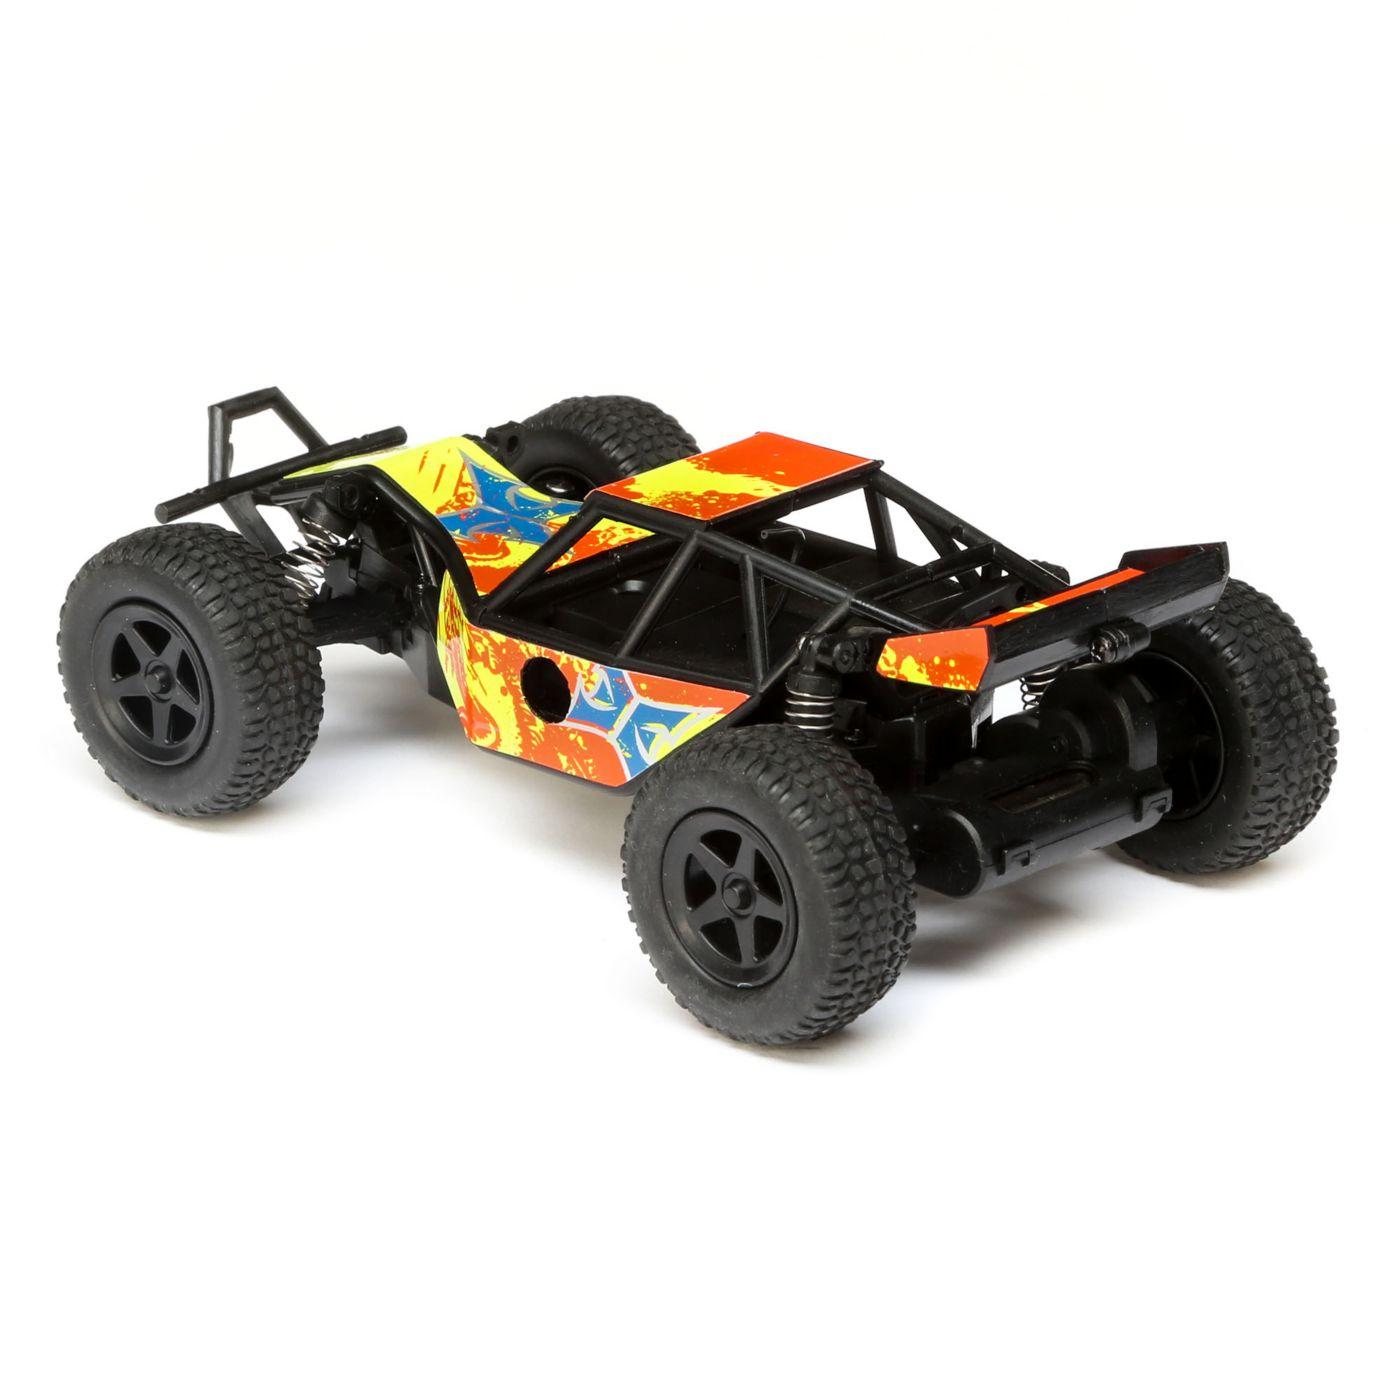 ECX Micro Roost Desert Buggy - Rear